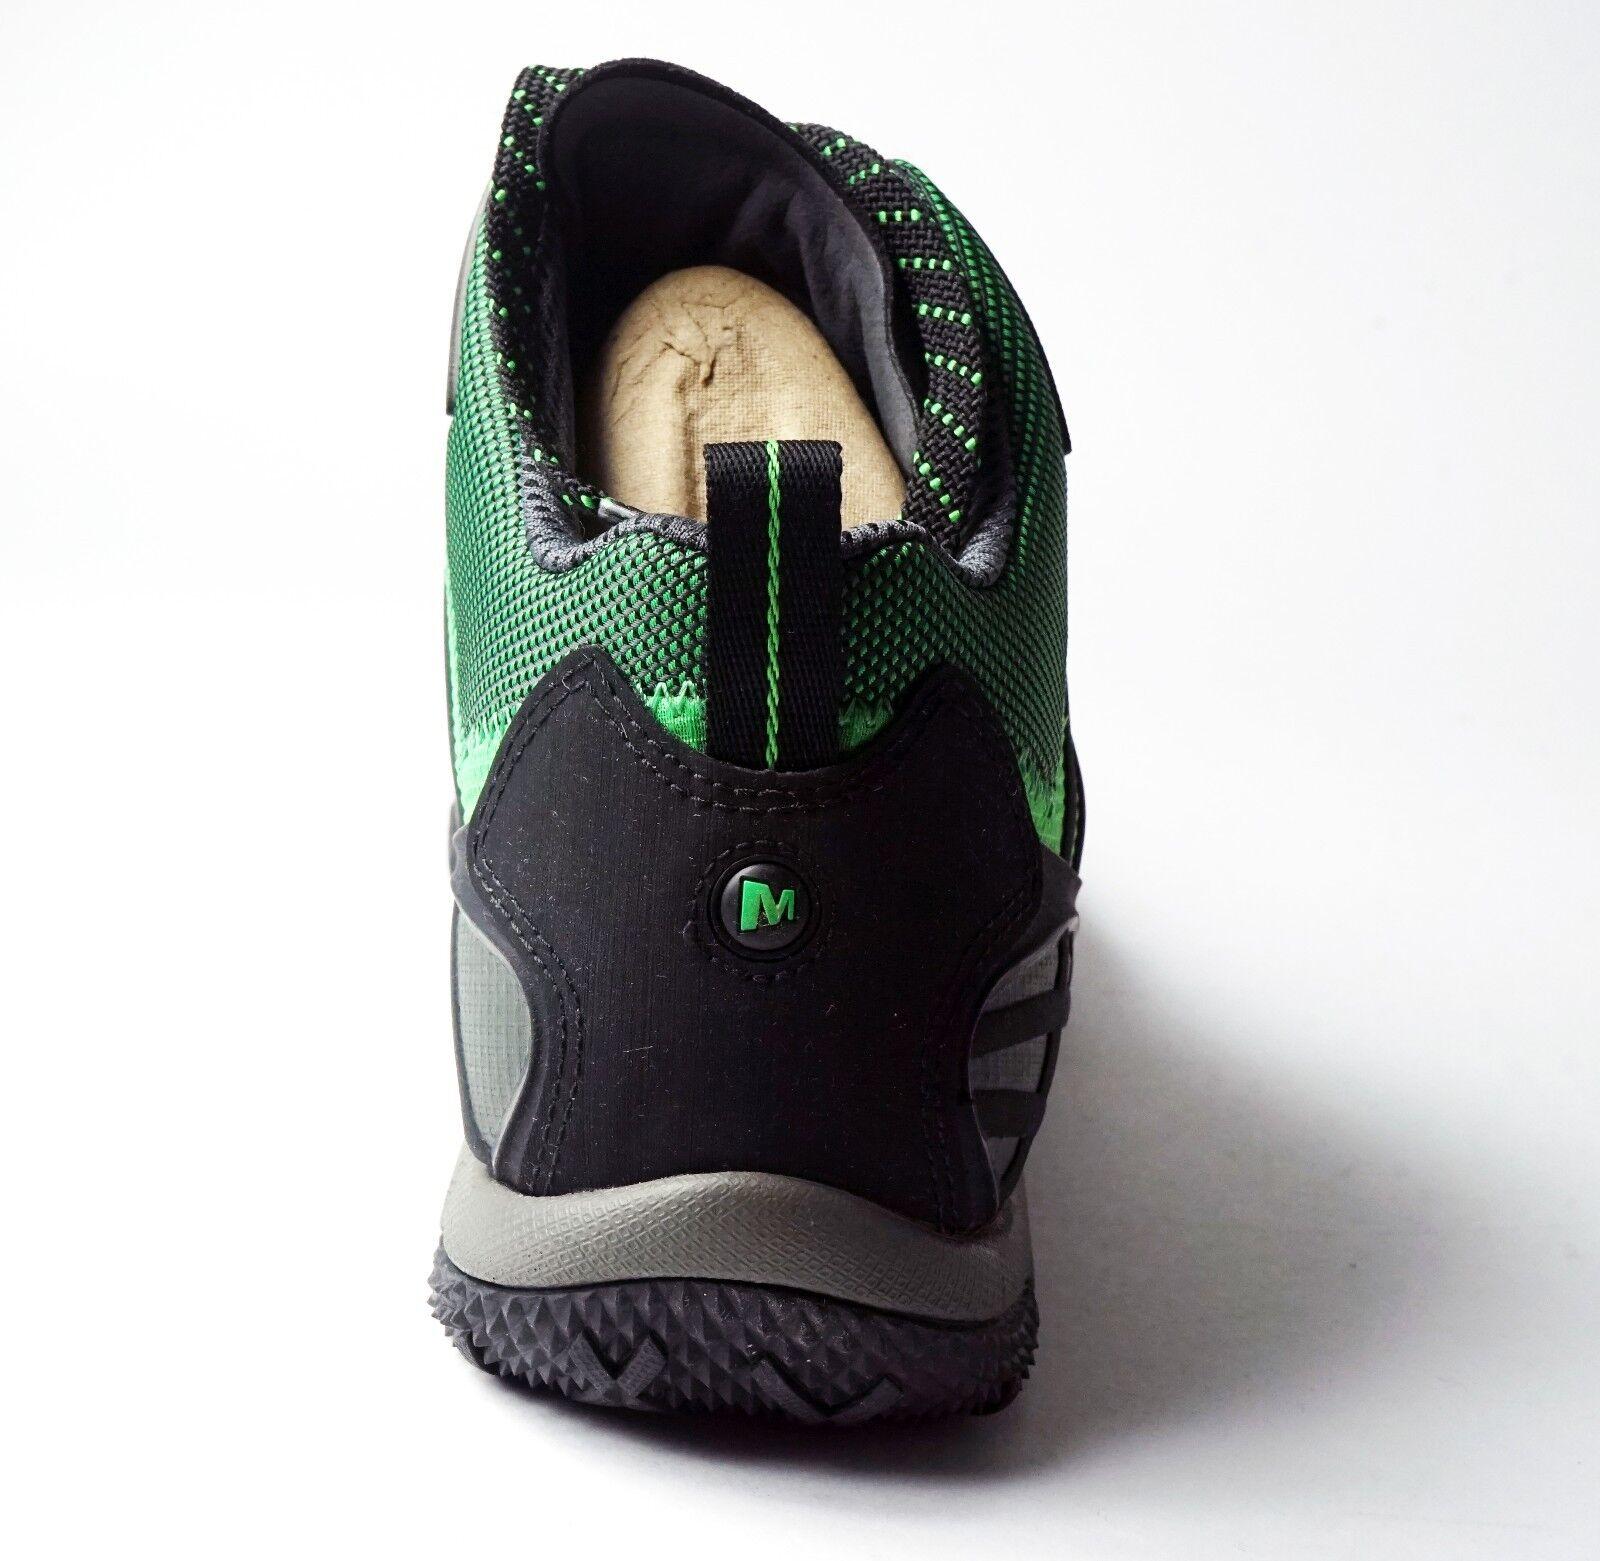 Merrell  Uomo Proterra Mid Walking Sports Grün Trekking Schuhes Walking Mid Hiking Schuhes(Sale) 5439e7